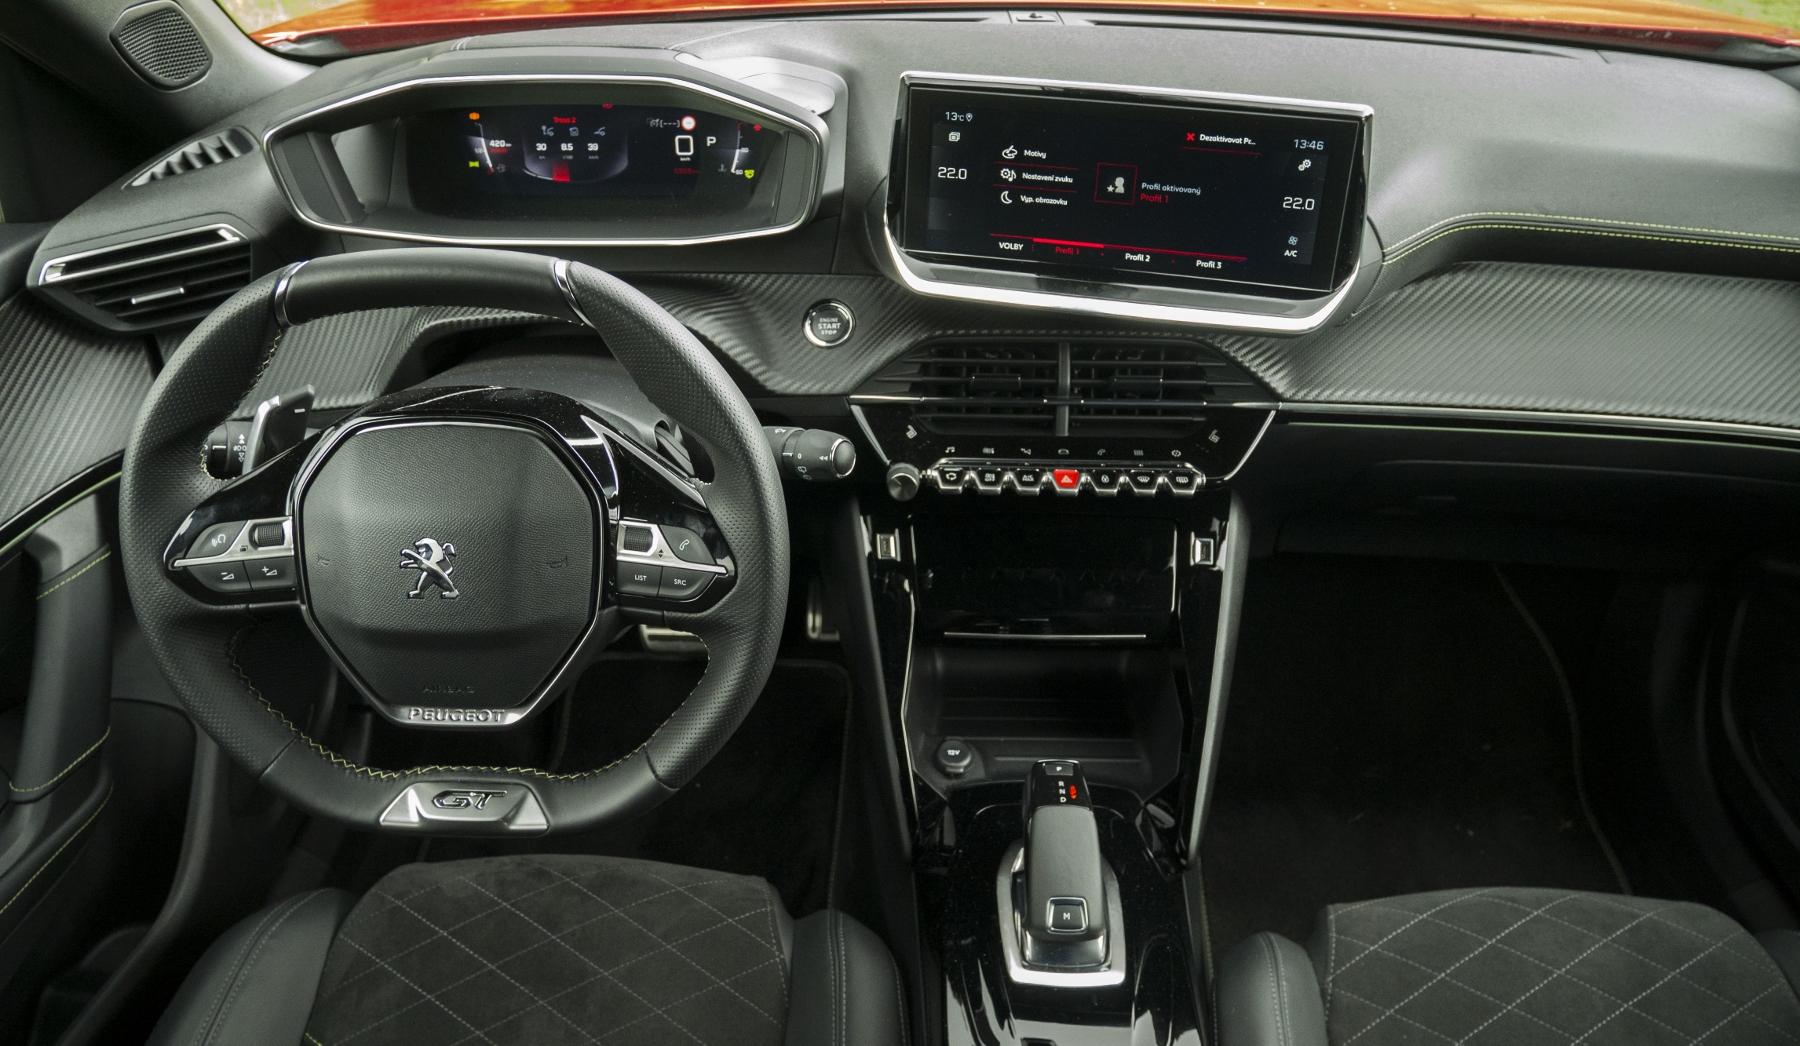 Test: Peugeot 2008 GT ohuruje silným trojvalcom a dobrou prevodovkou 2k2J2iPunT peugeot-2008-49